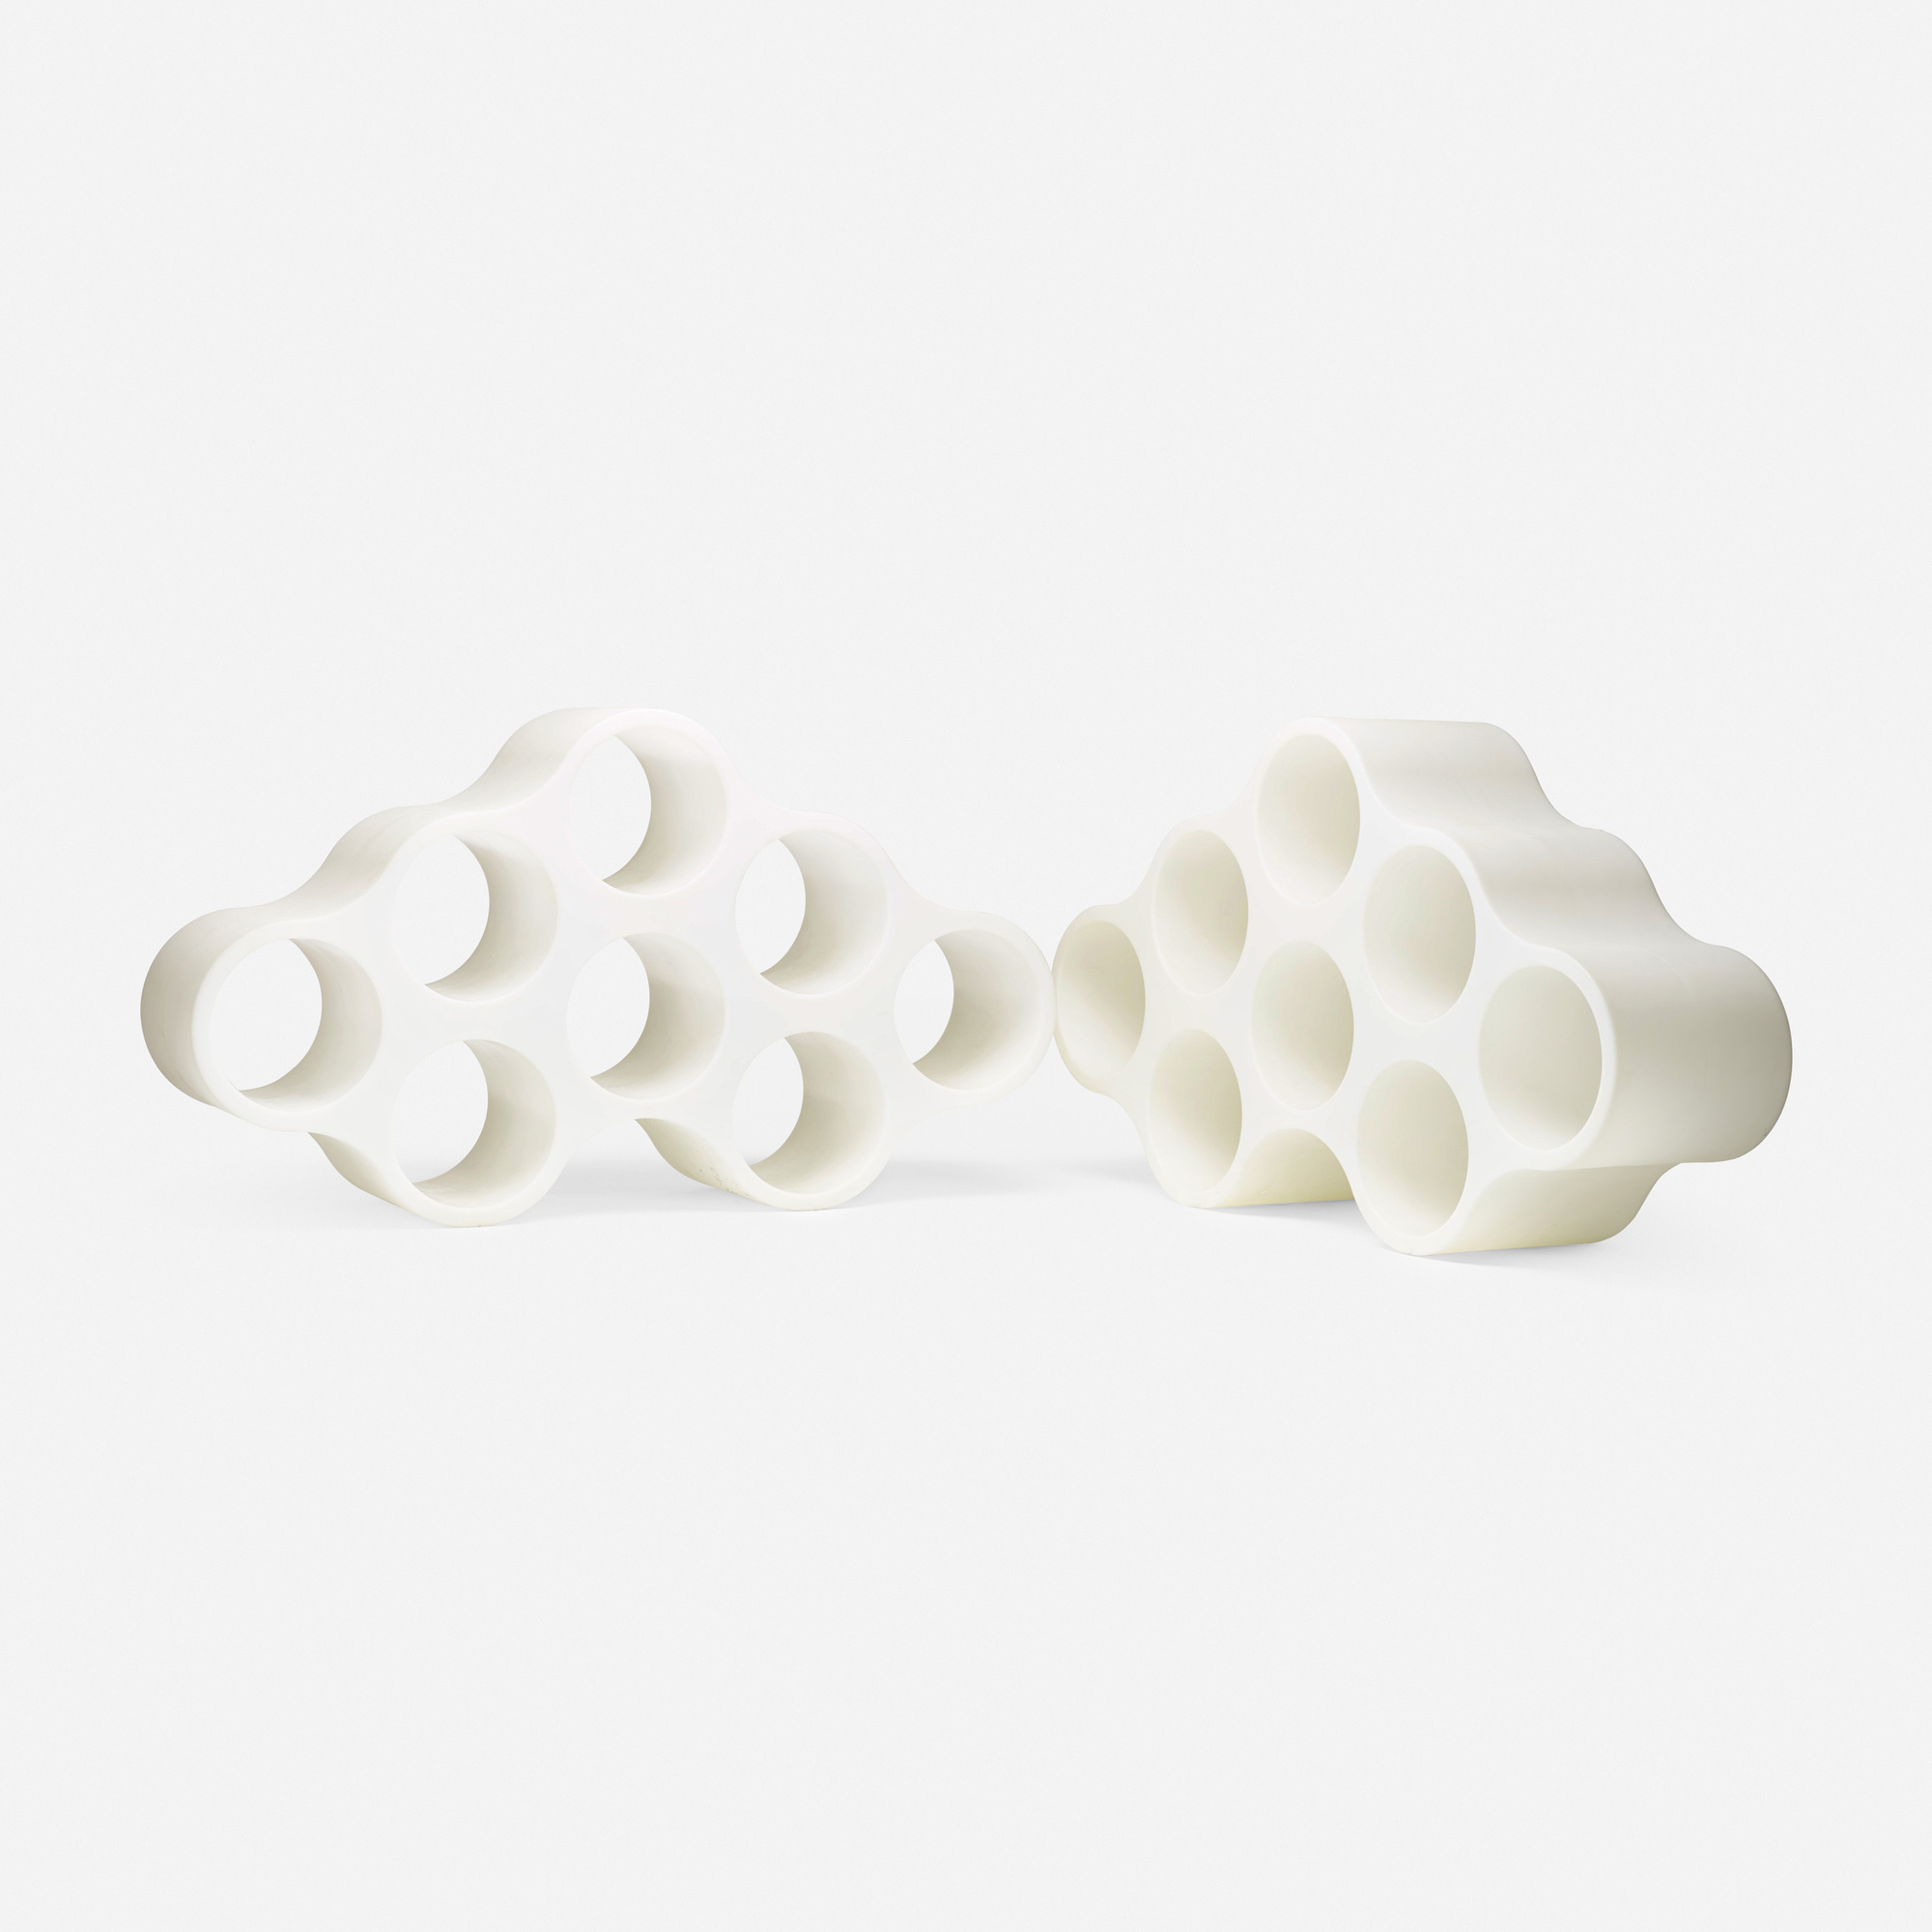 180: Ronan & Erwan Bouroullec / Cloud shelving systems, pair (1 of 3)